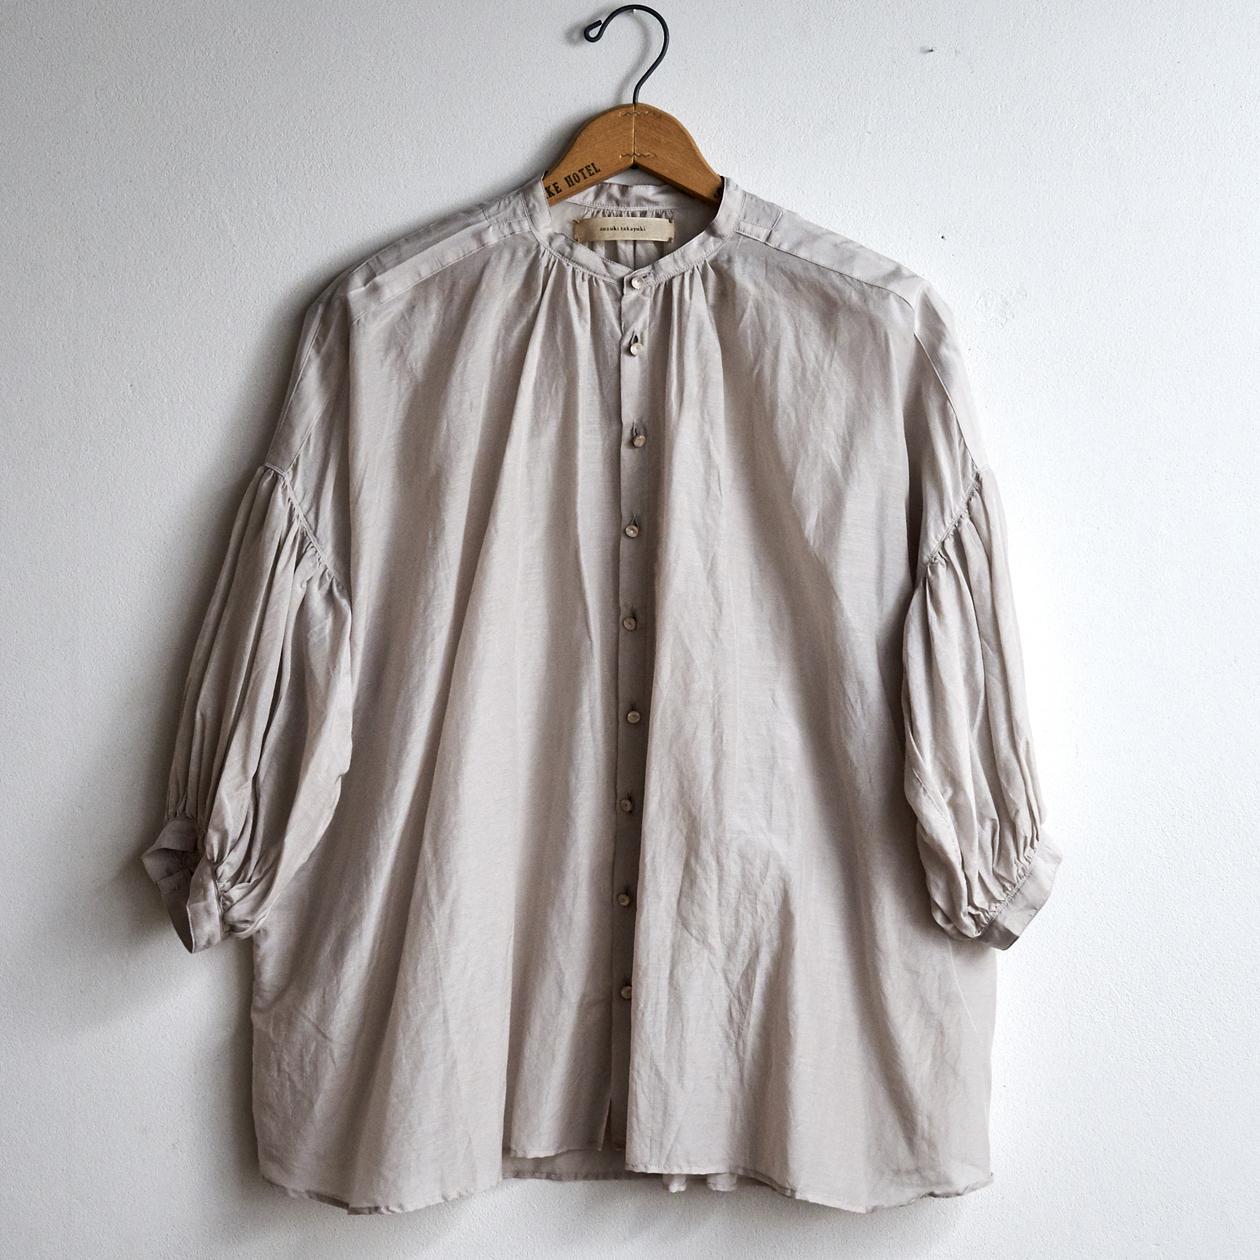 suzuki takayuki スズキタカユキ puff-sleeve blouse ice grey S211-13 (レディース)